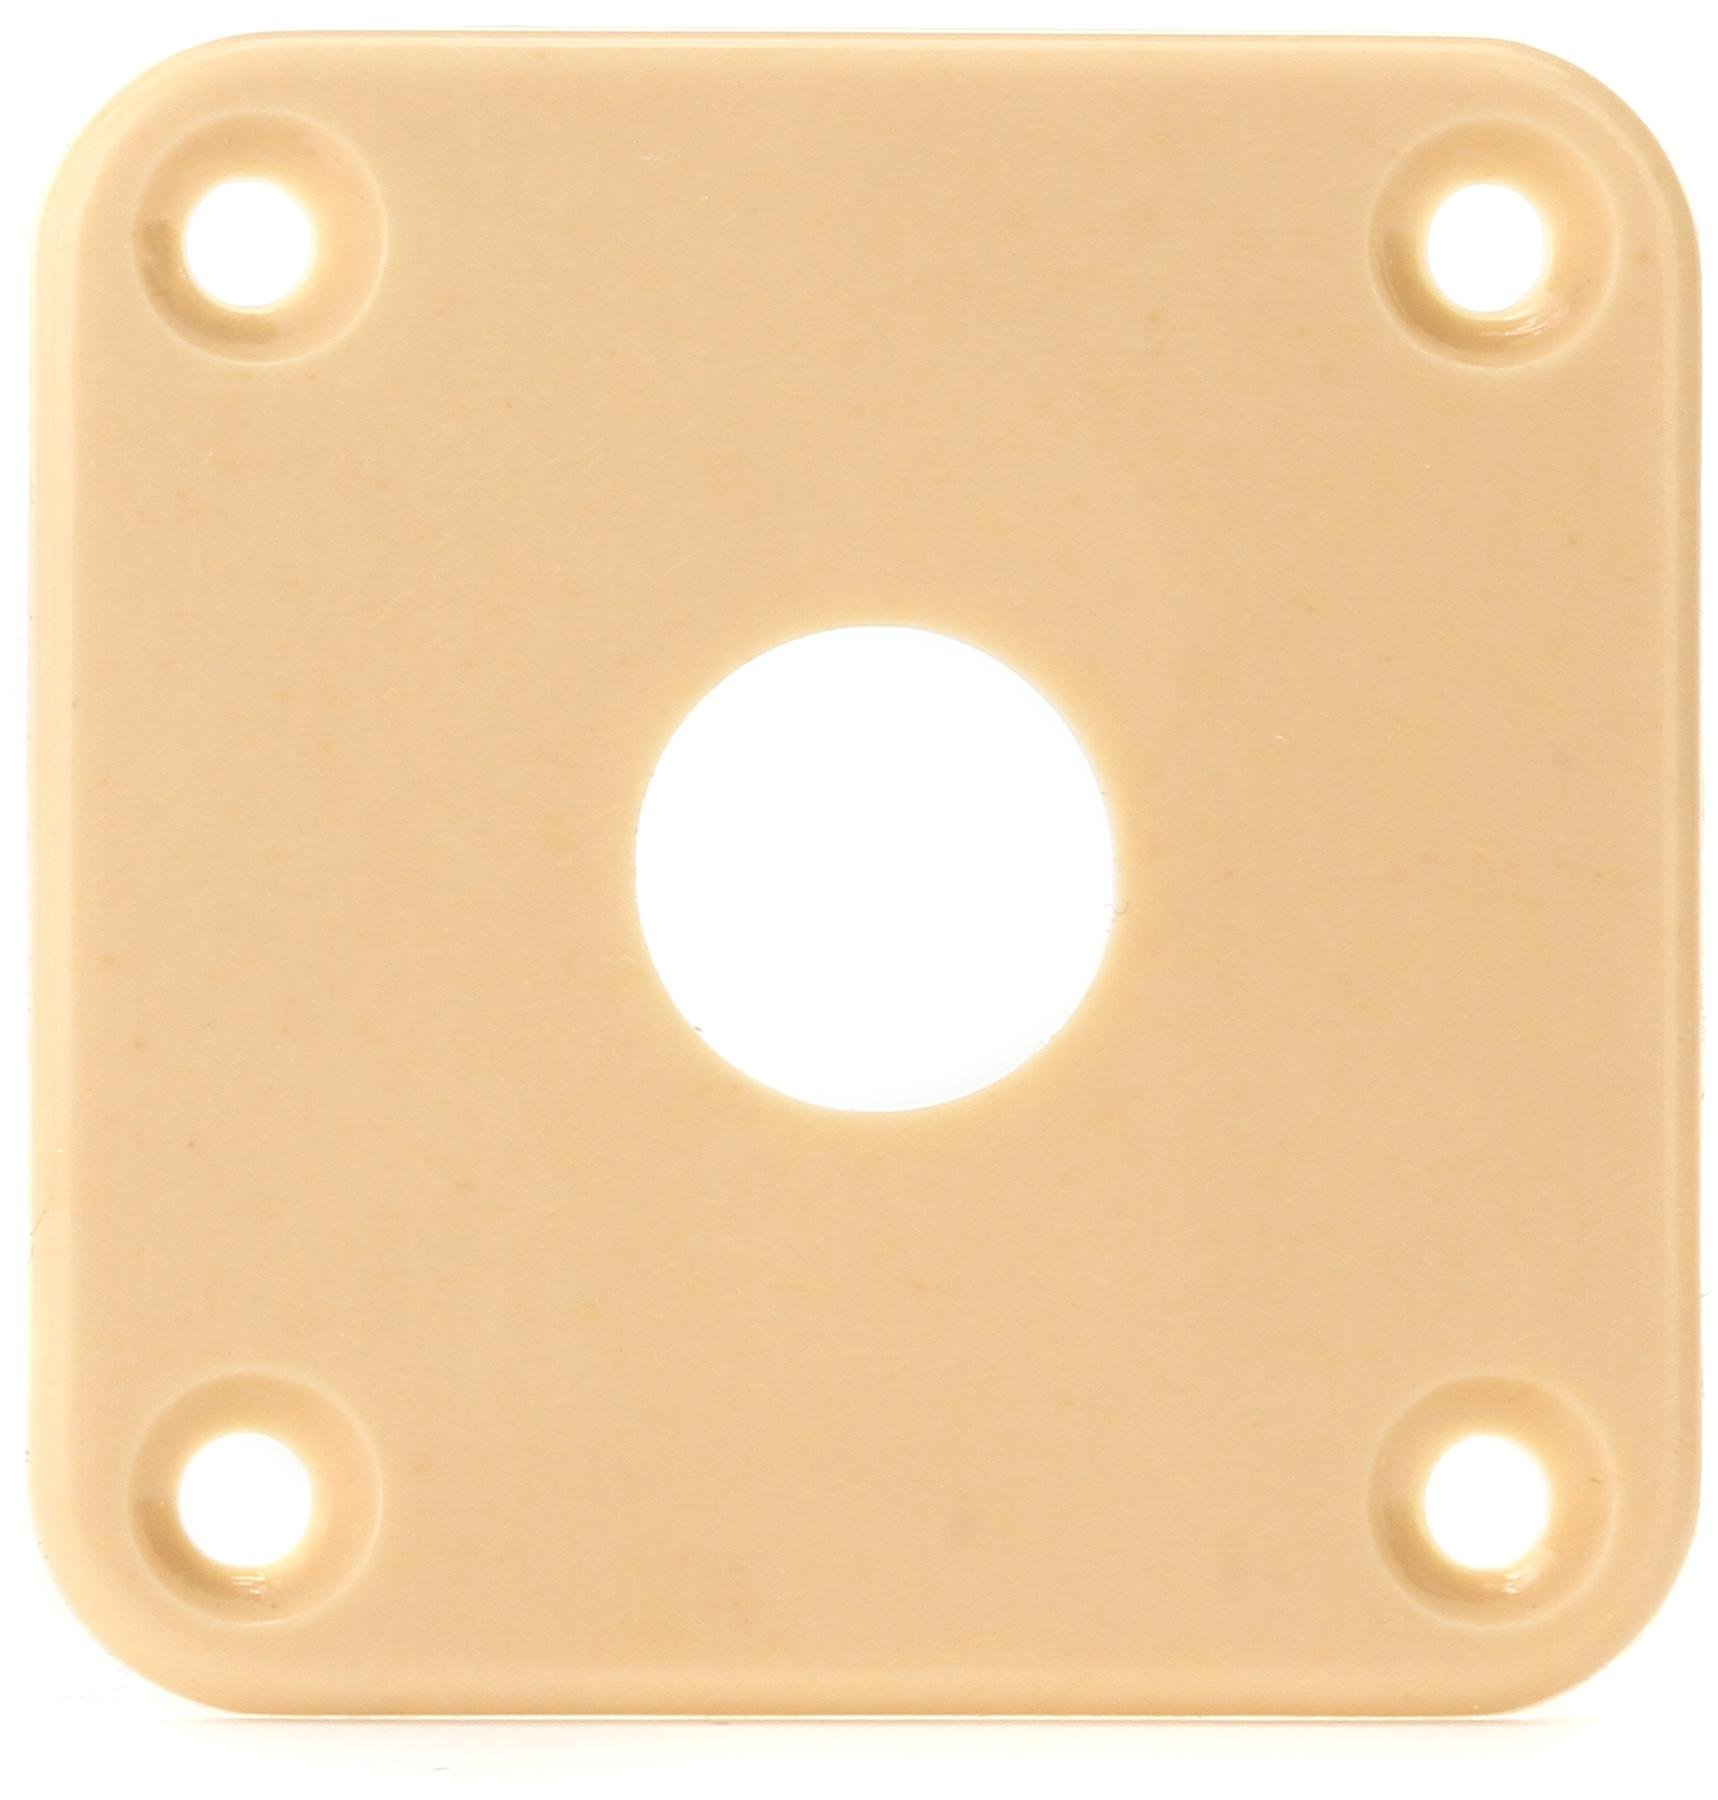 Creme Plastic Gibson Gear PRJP-030 Jack Plate